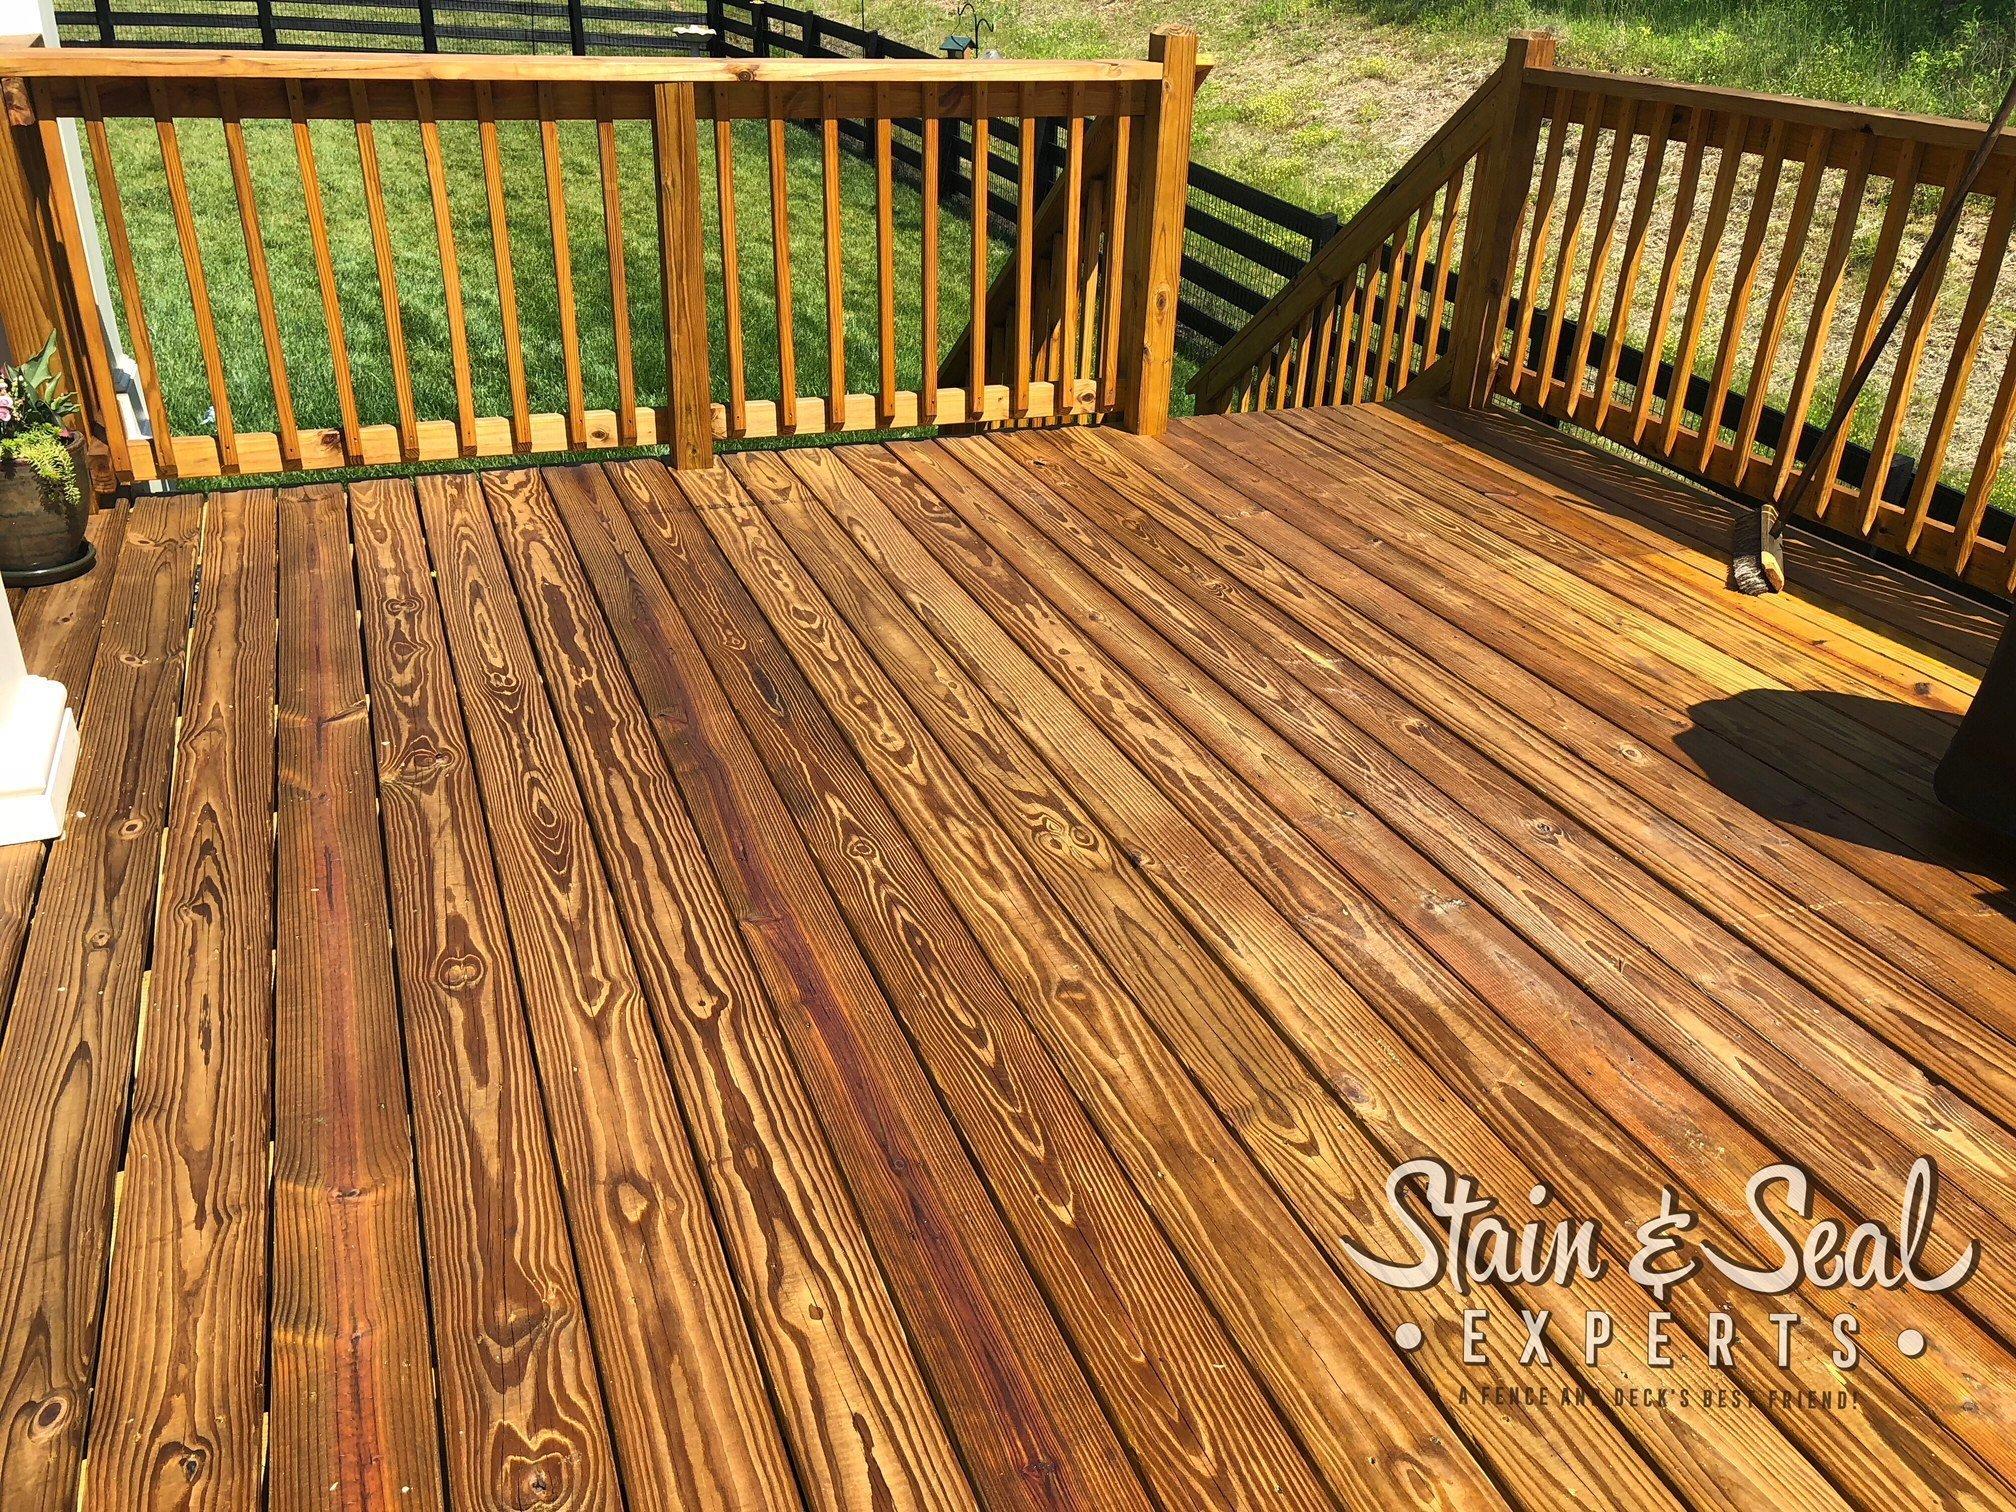 Semi Transpa Deck Stain Sealer 5